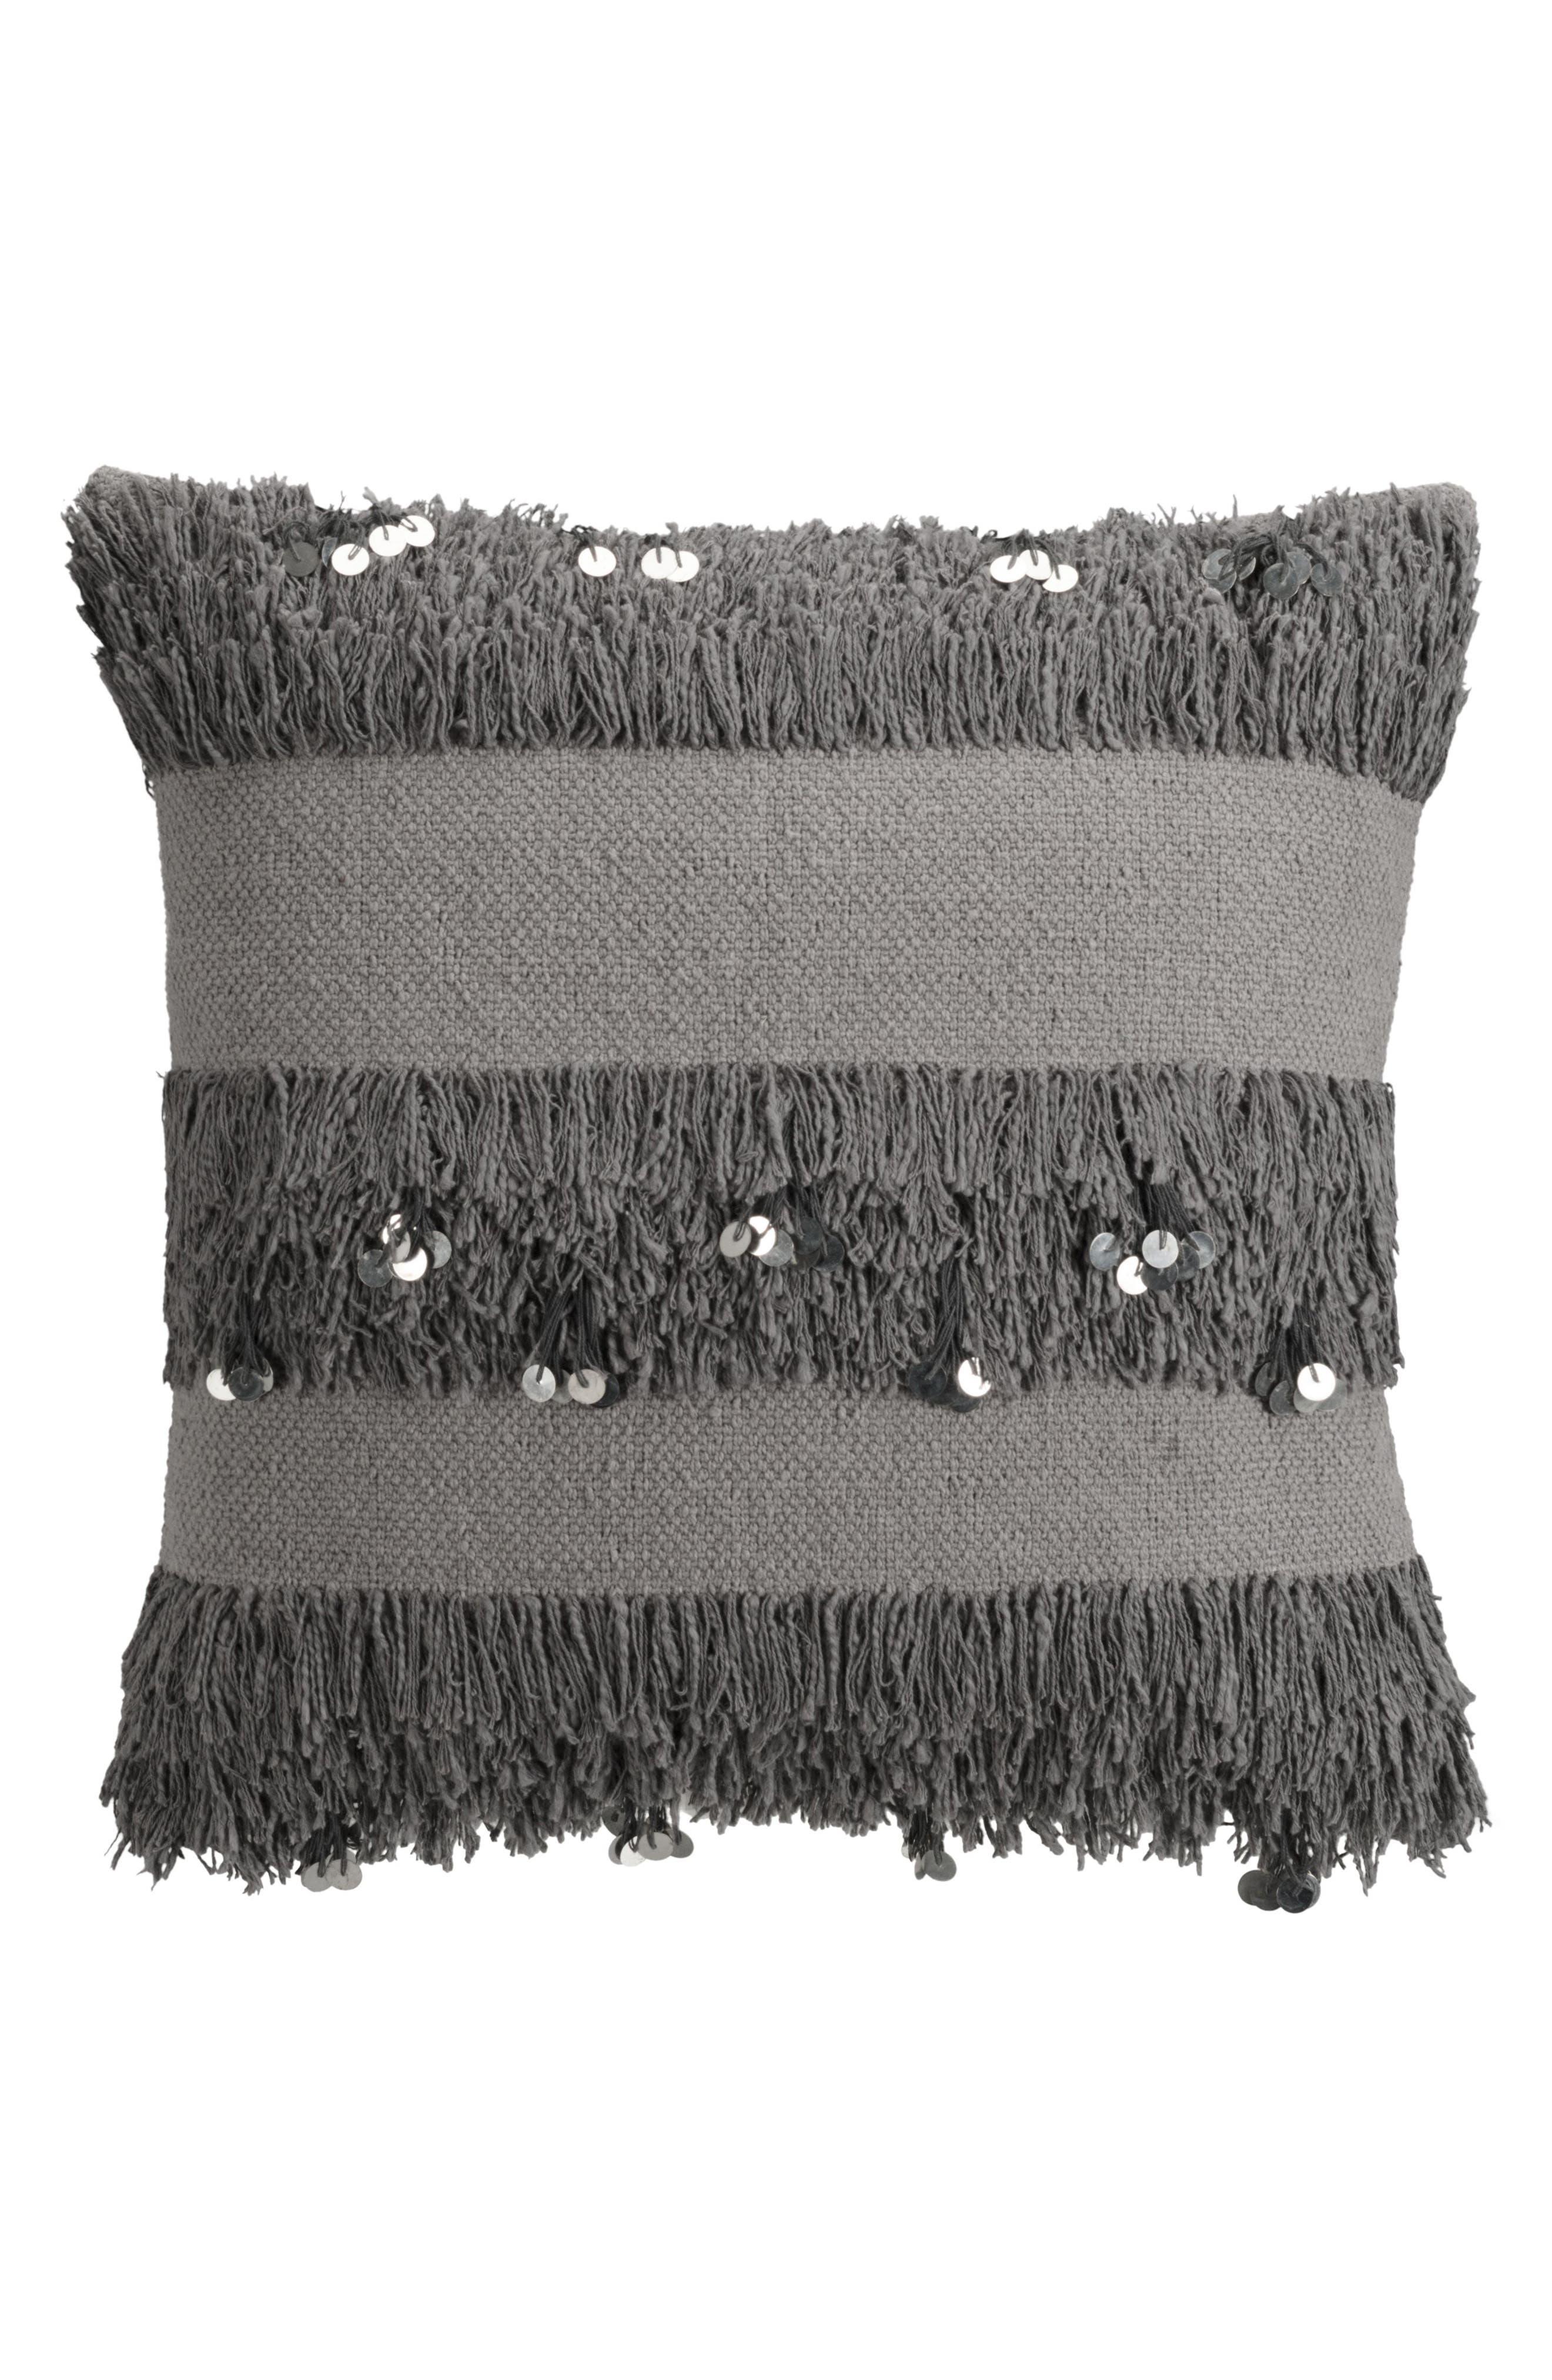 cupcakes & cashmere Sequin Fringe Pillow